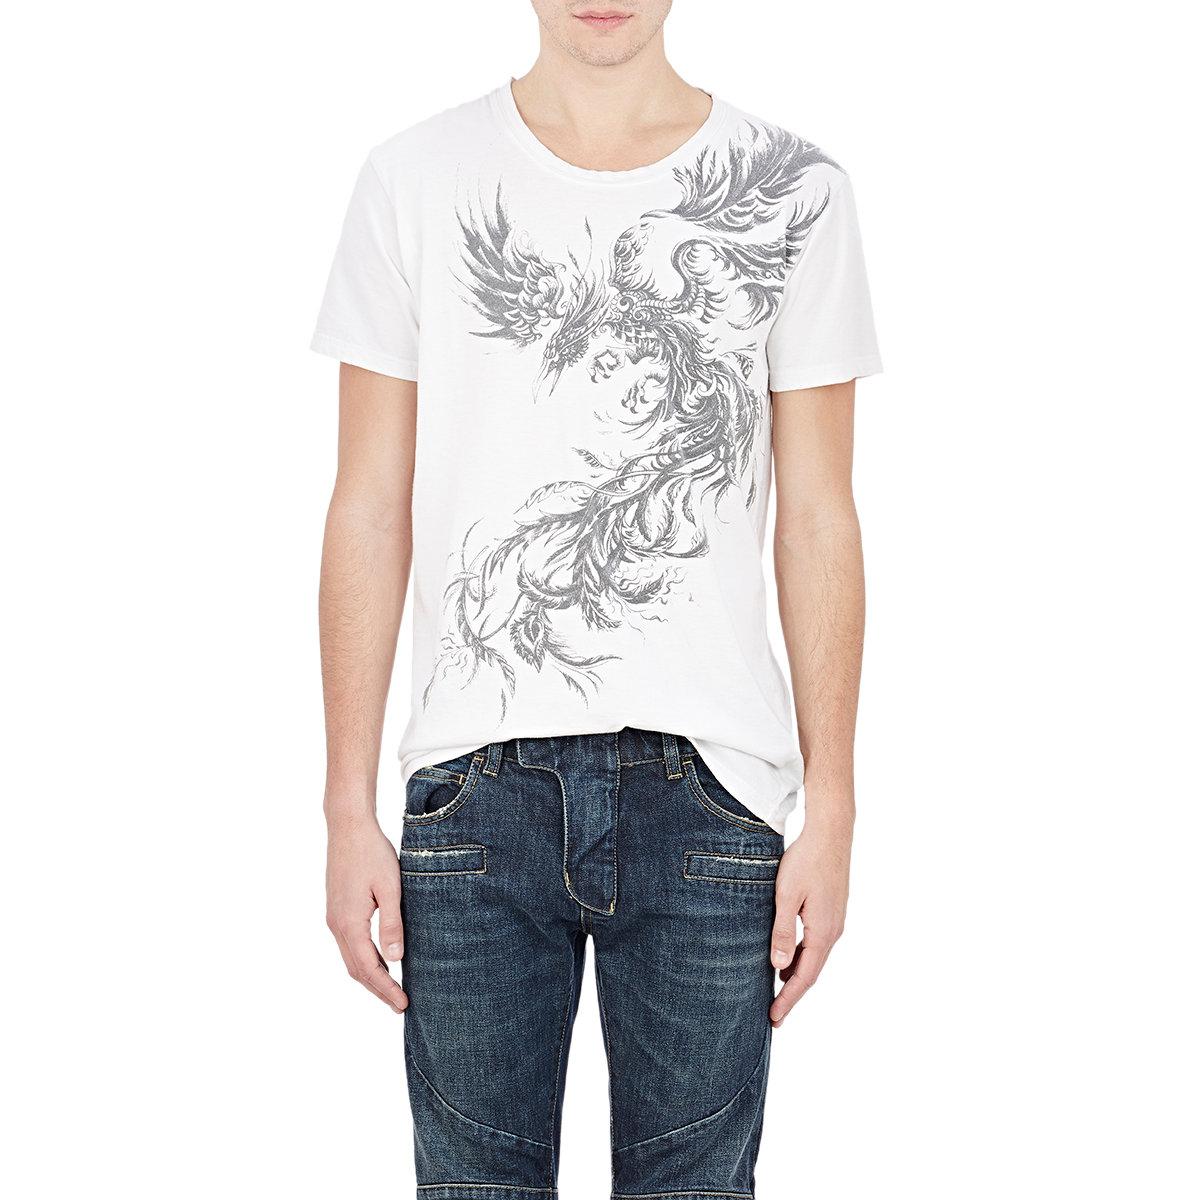 Lyst balmain phoenix print t shirt in white for Phoenix t shirt printing